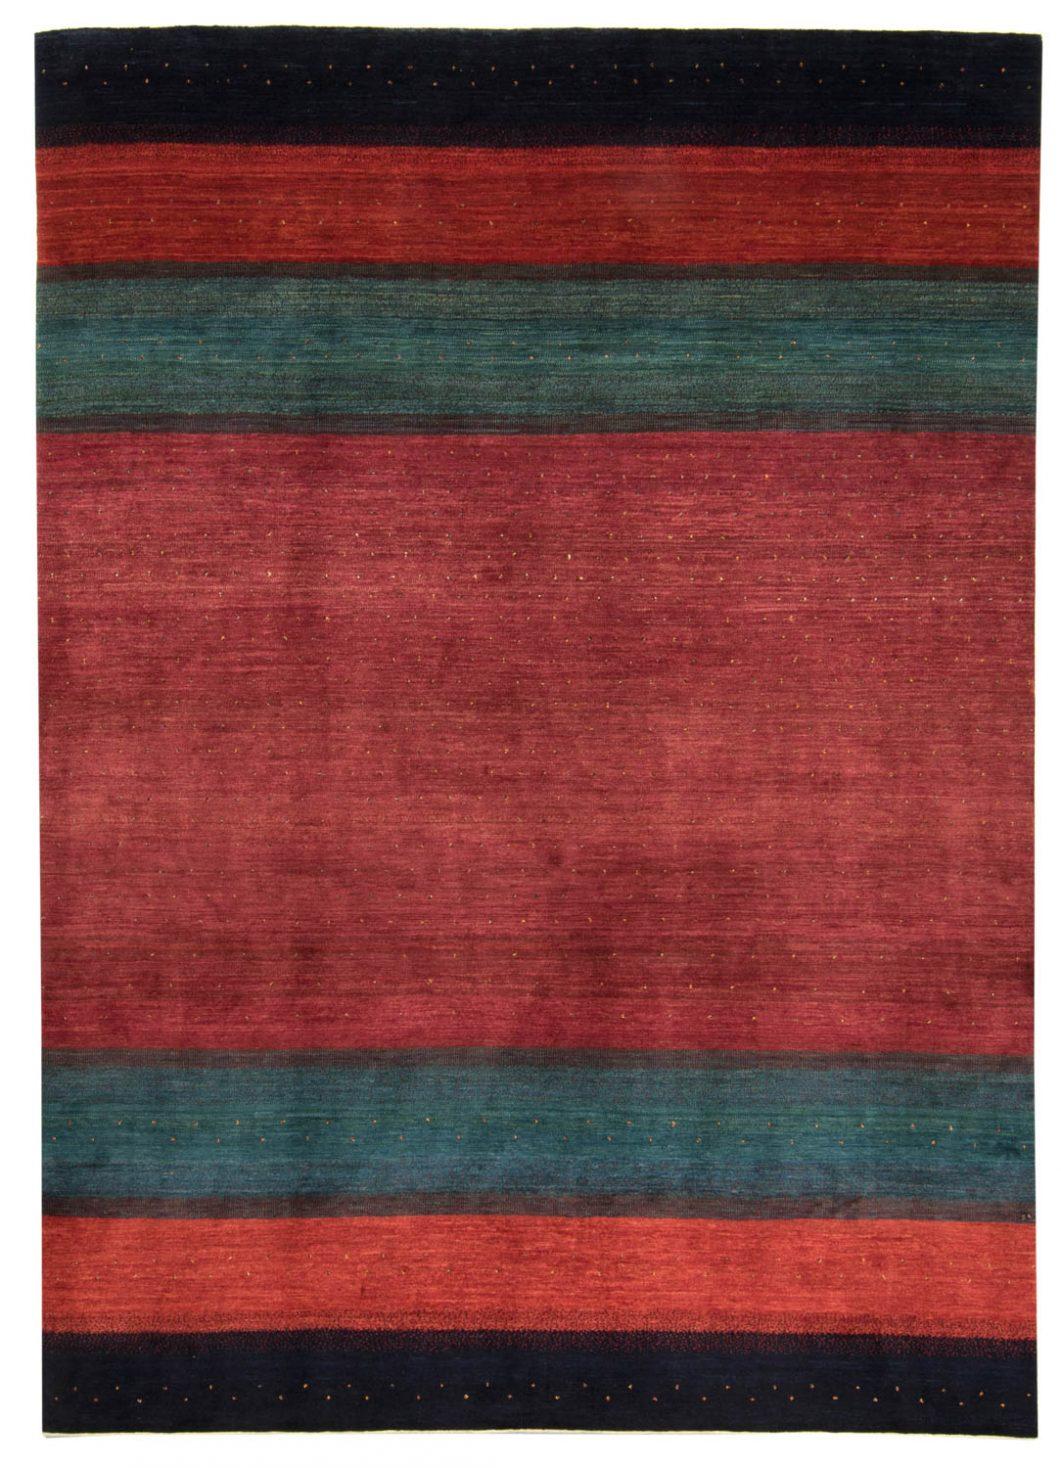 a literary analysis of the persian carpet by hanan al shaykh